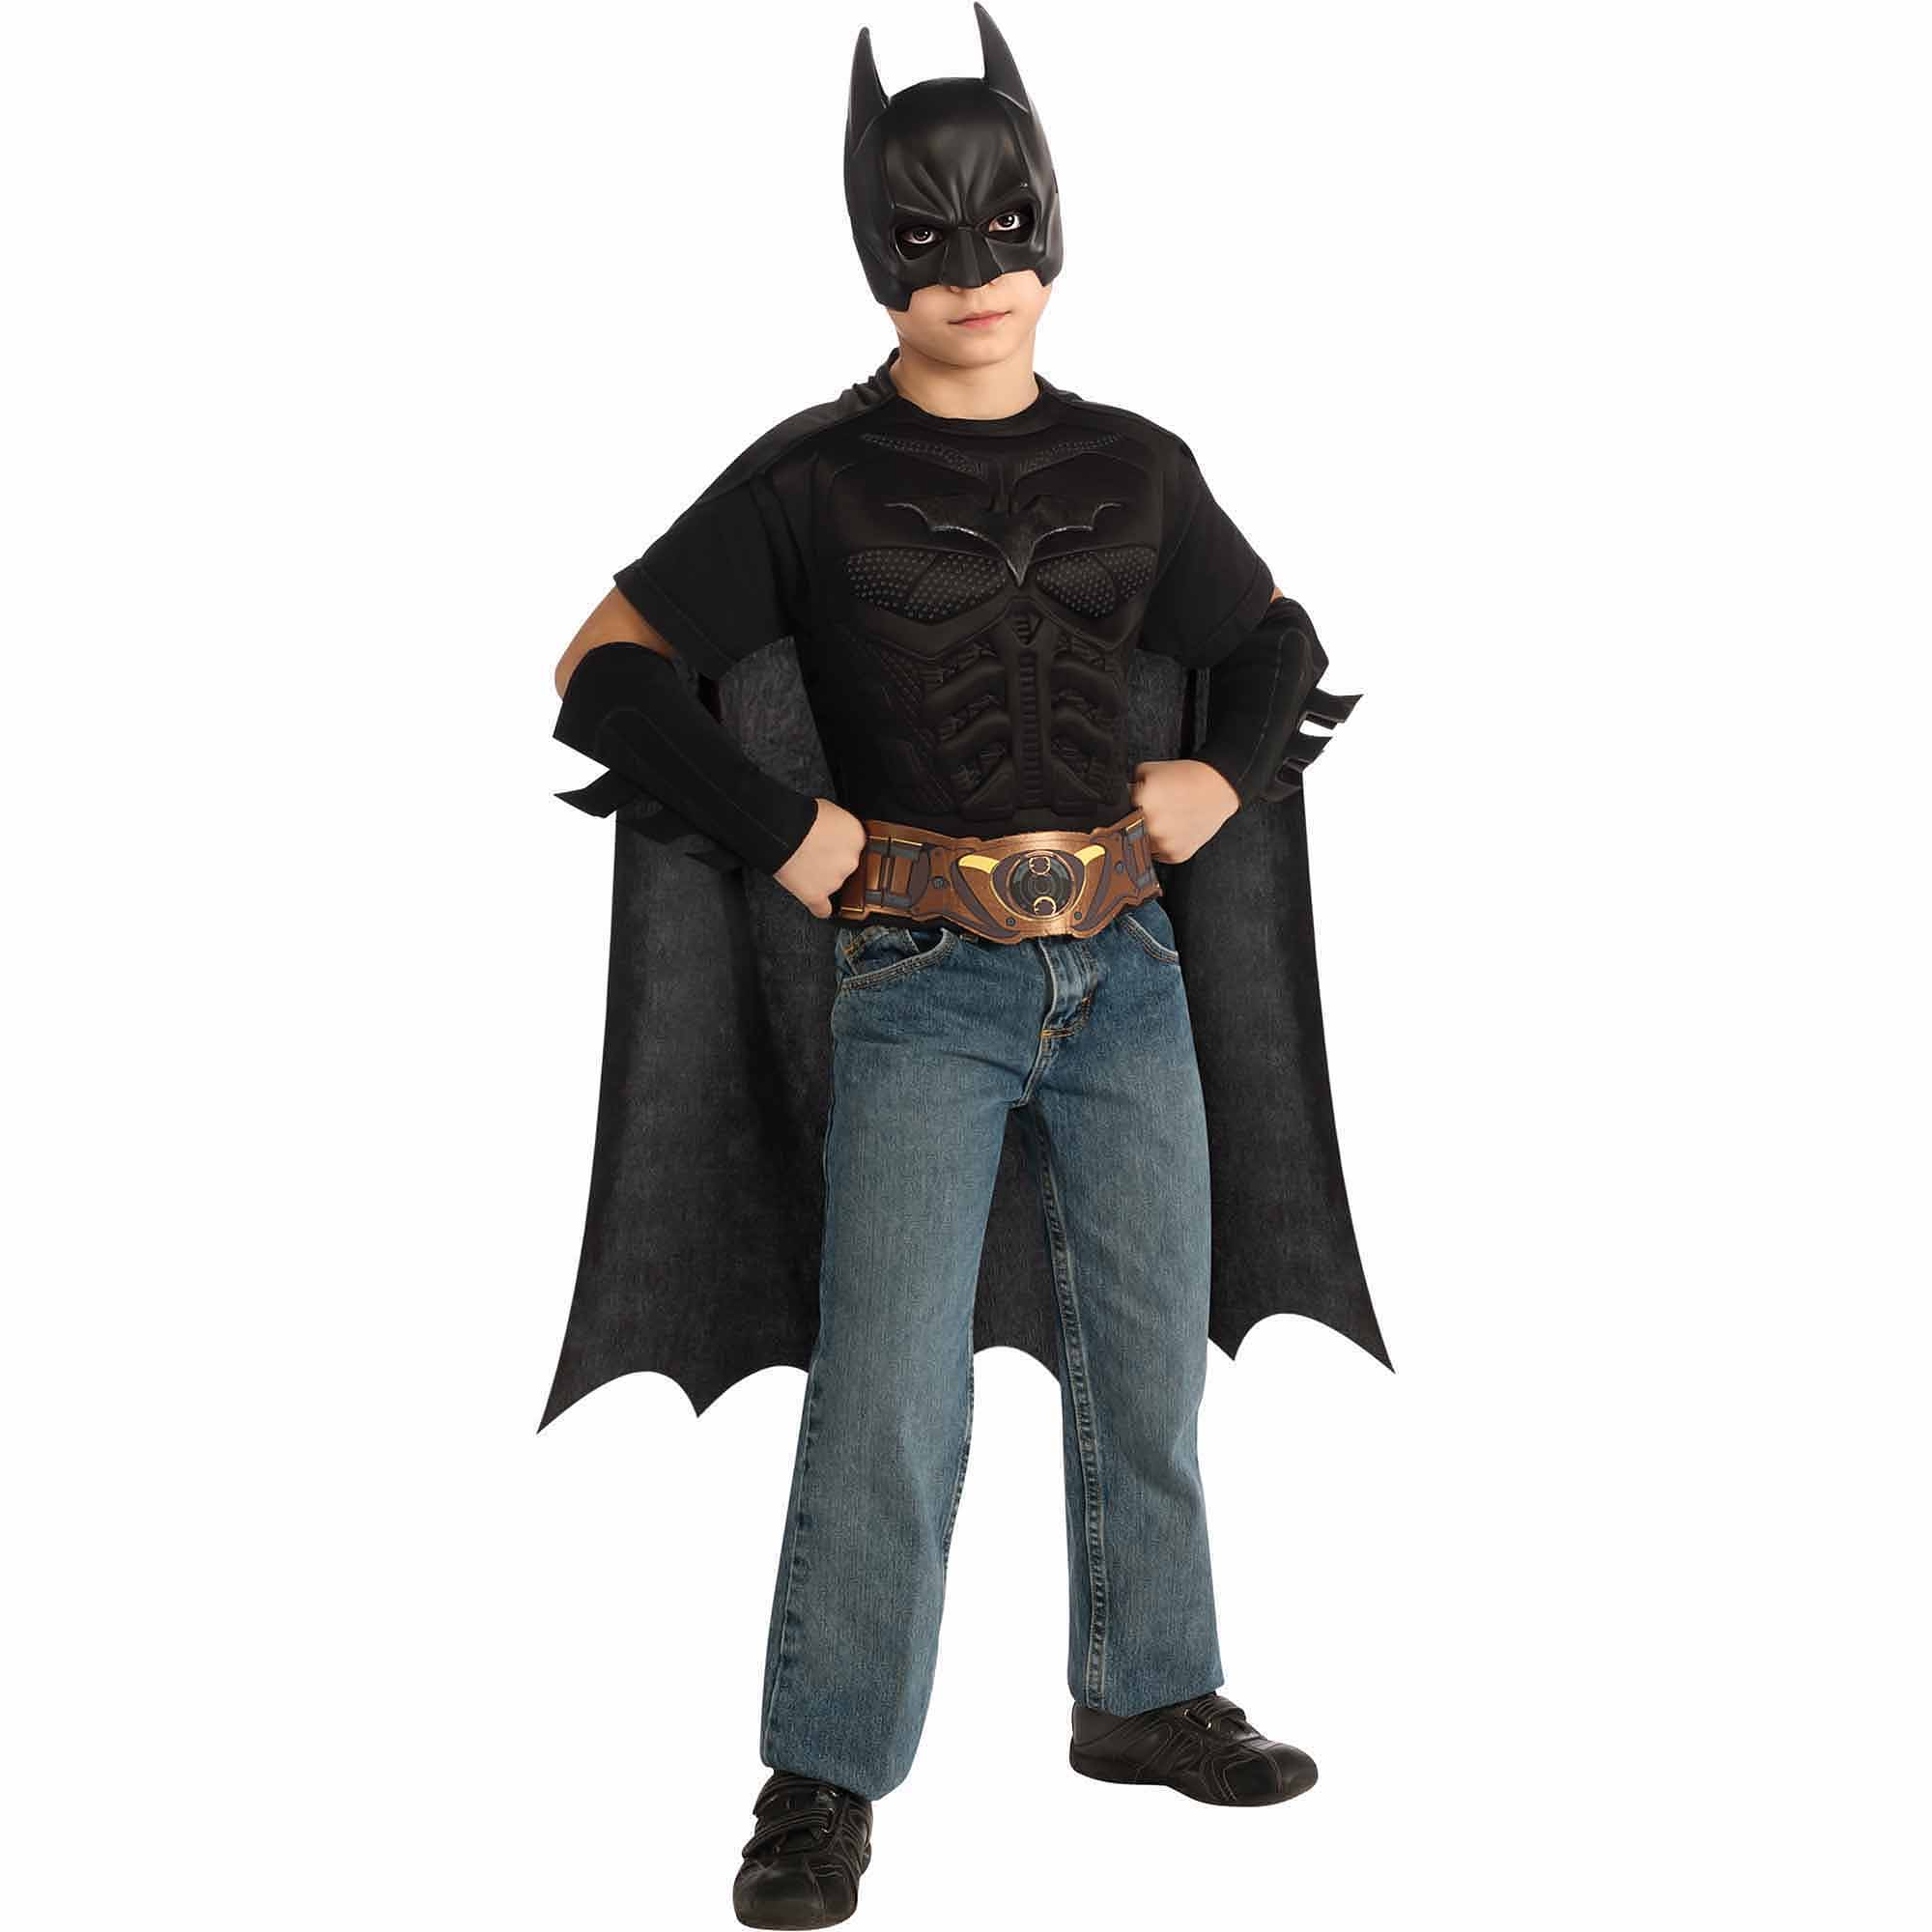 Batman Costume Kit Child Halloween Accessory